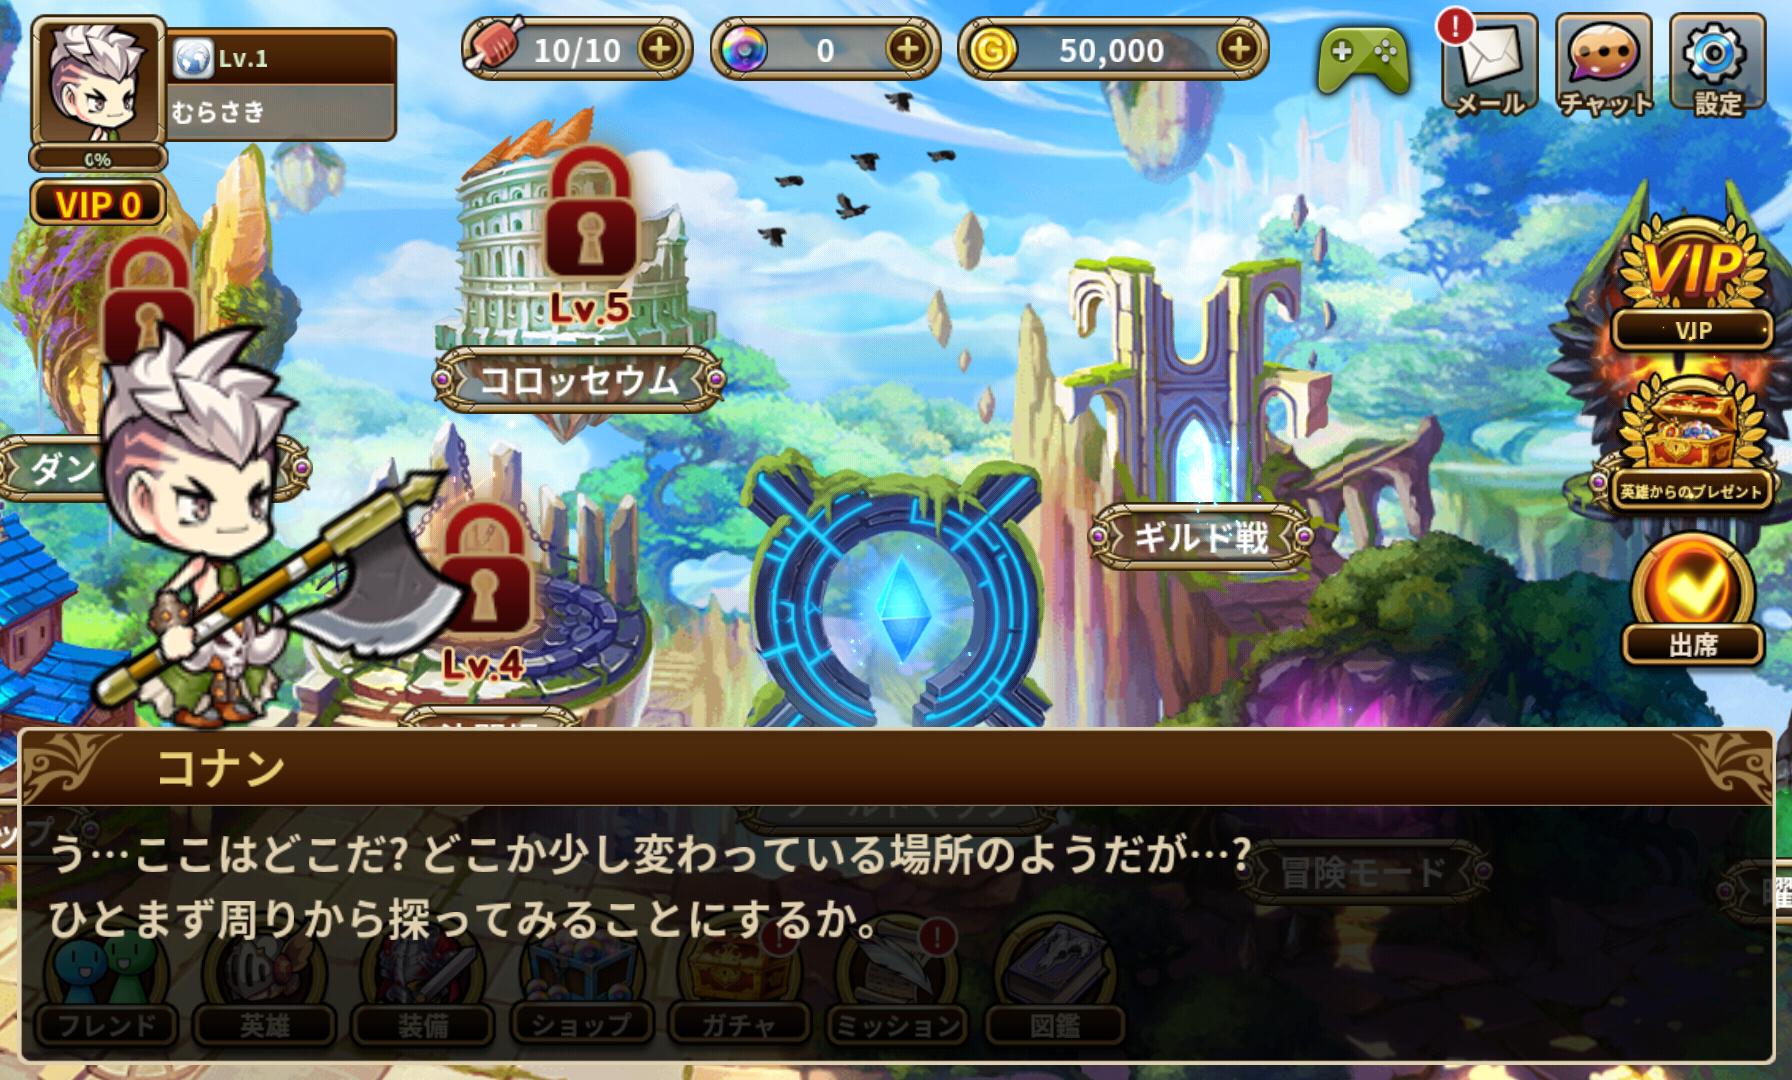 androidアプリ ボコスカ英雄伝攻略スクリーンショット2